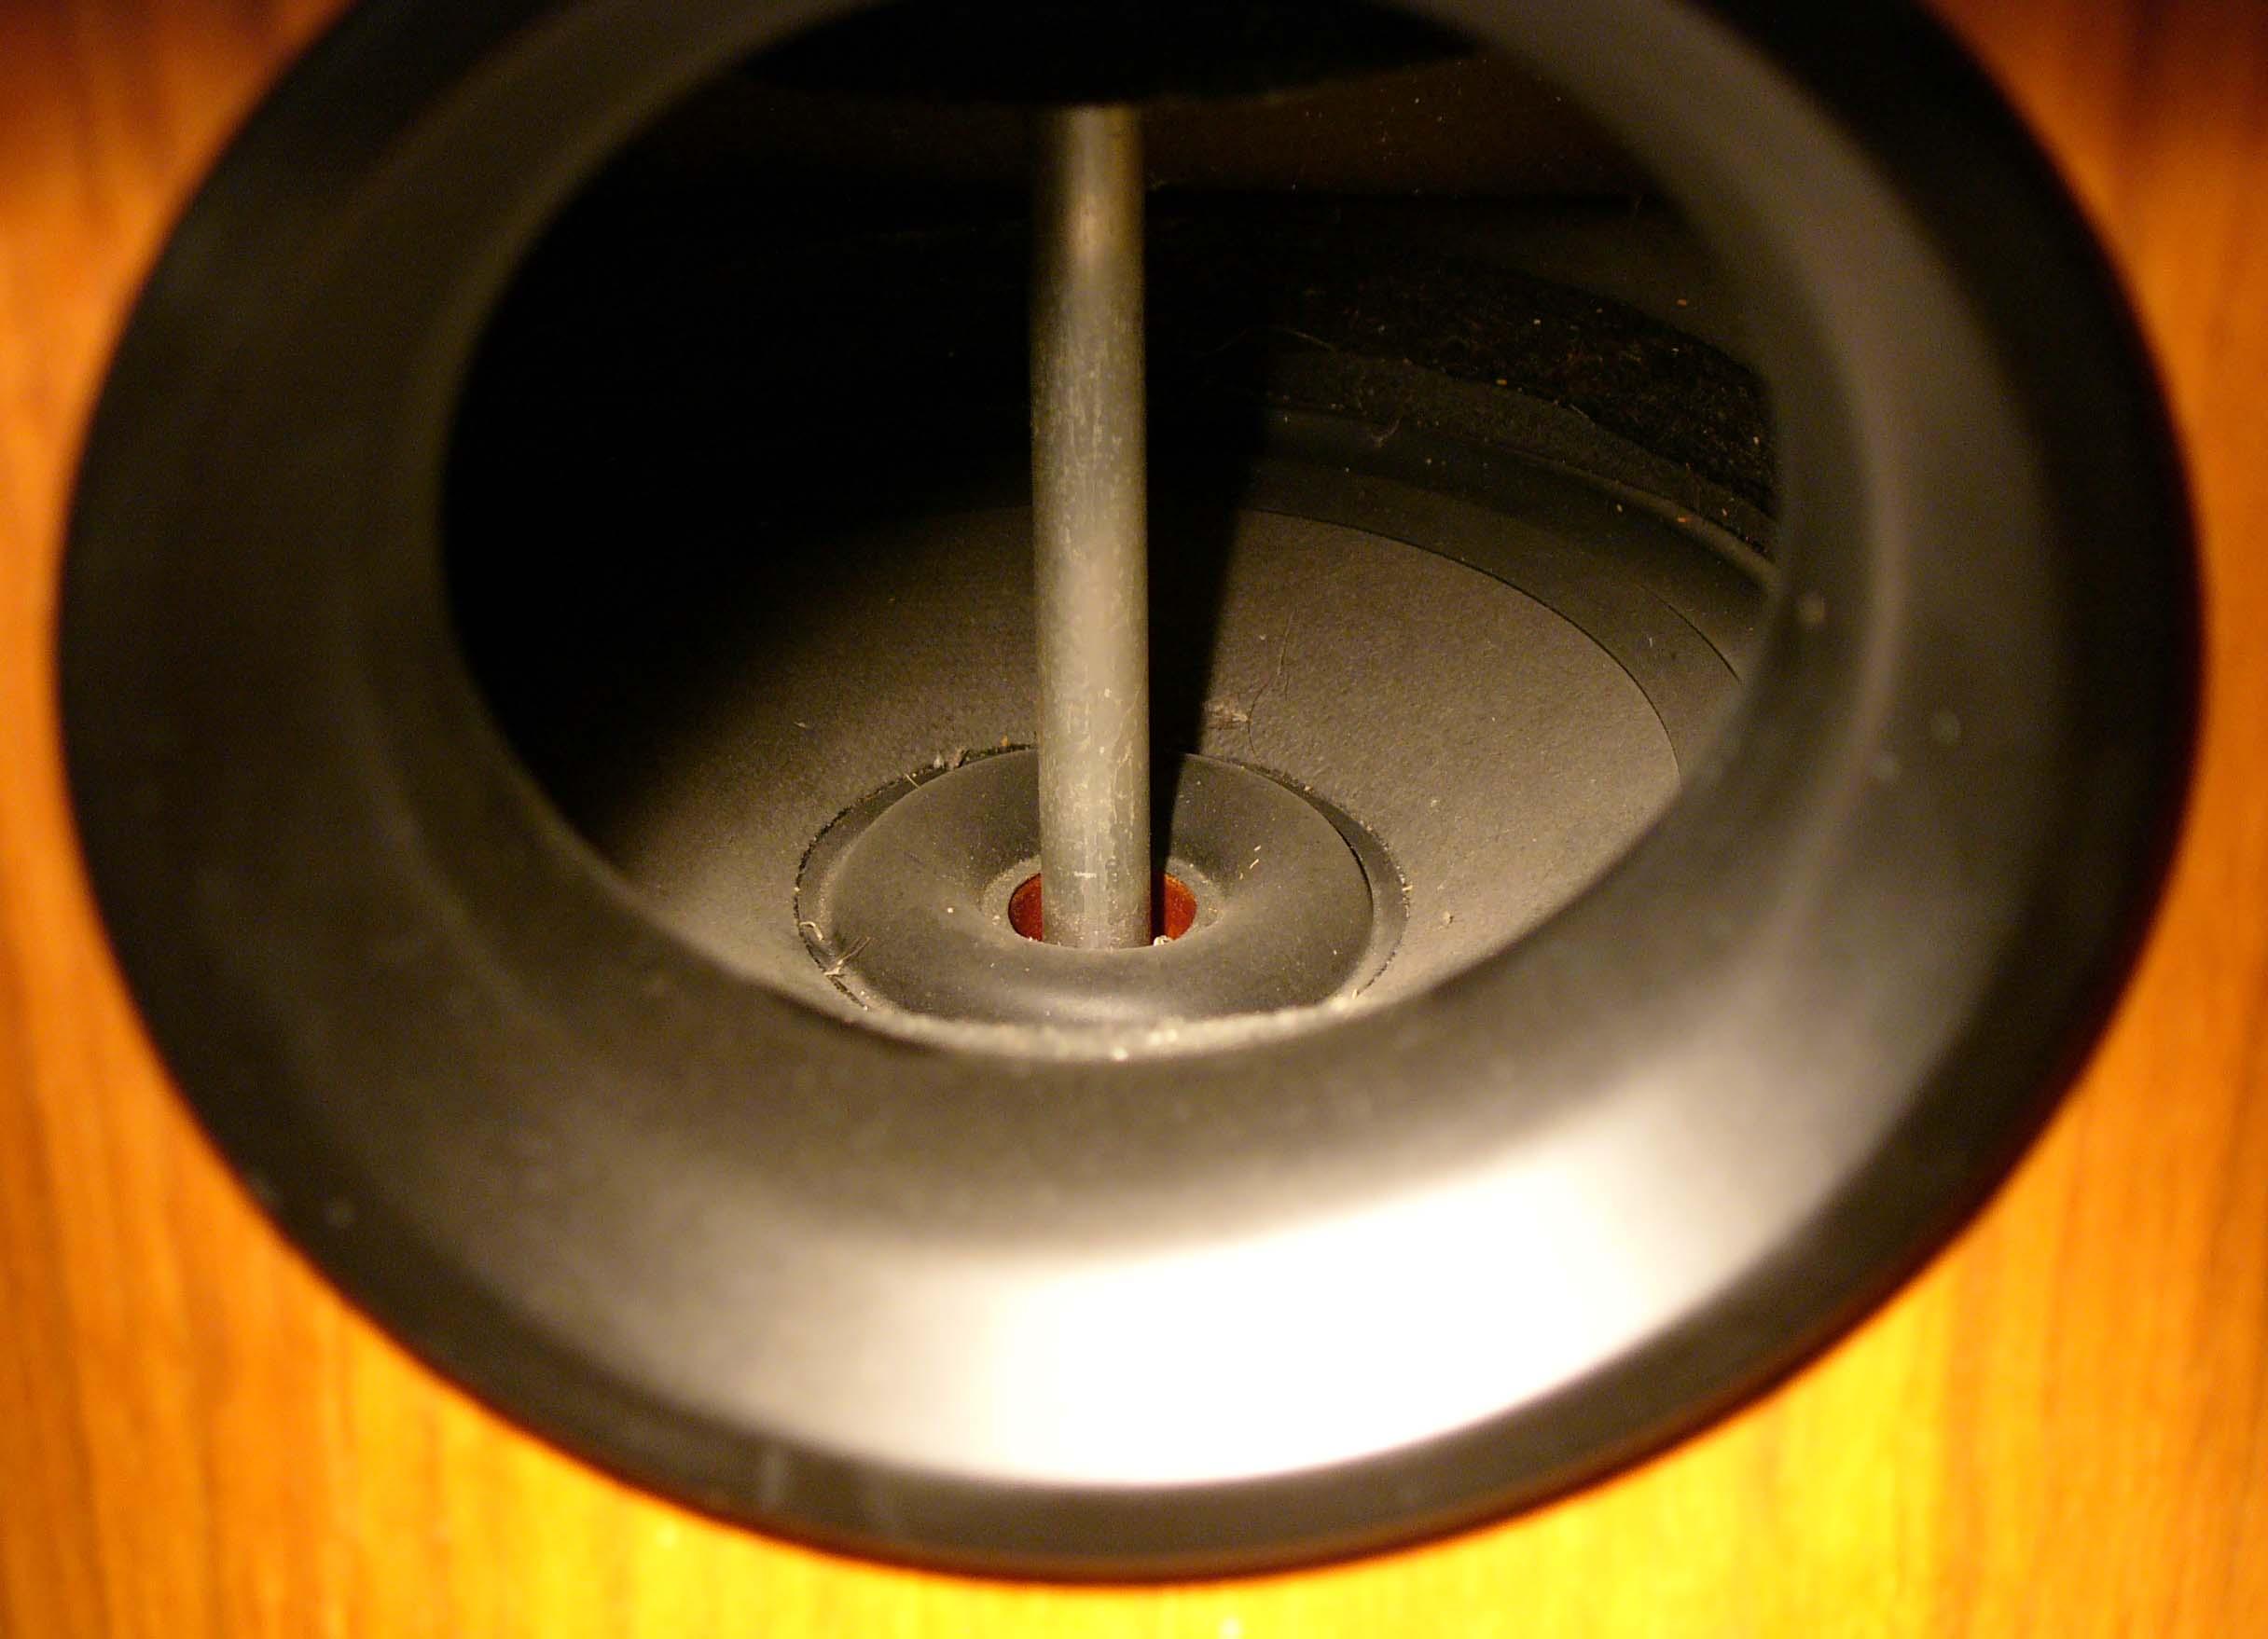 Local Polkies: Help with refoam? — Polk Audio